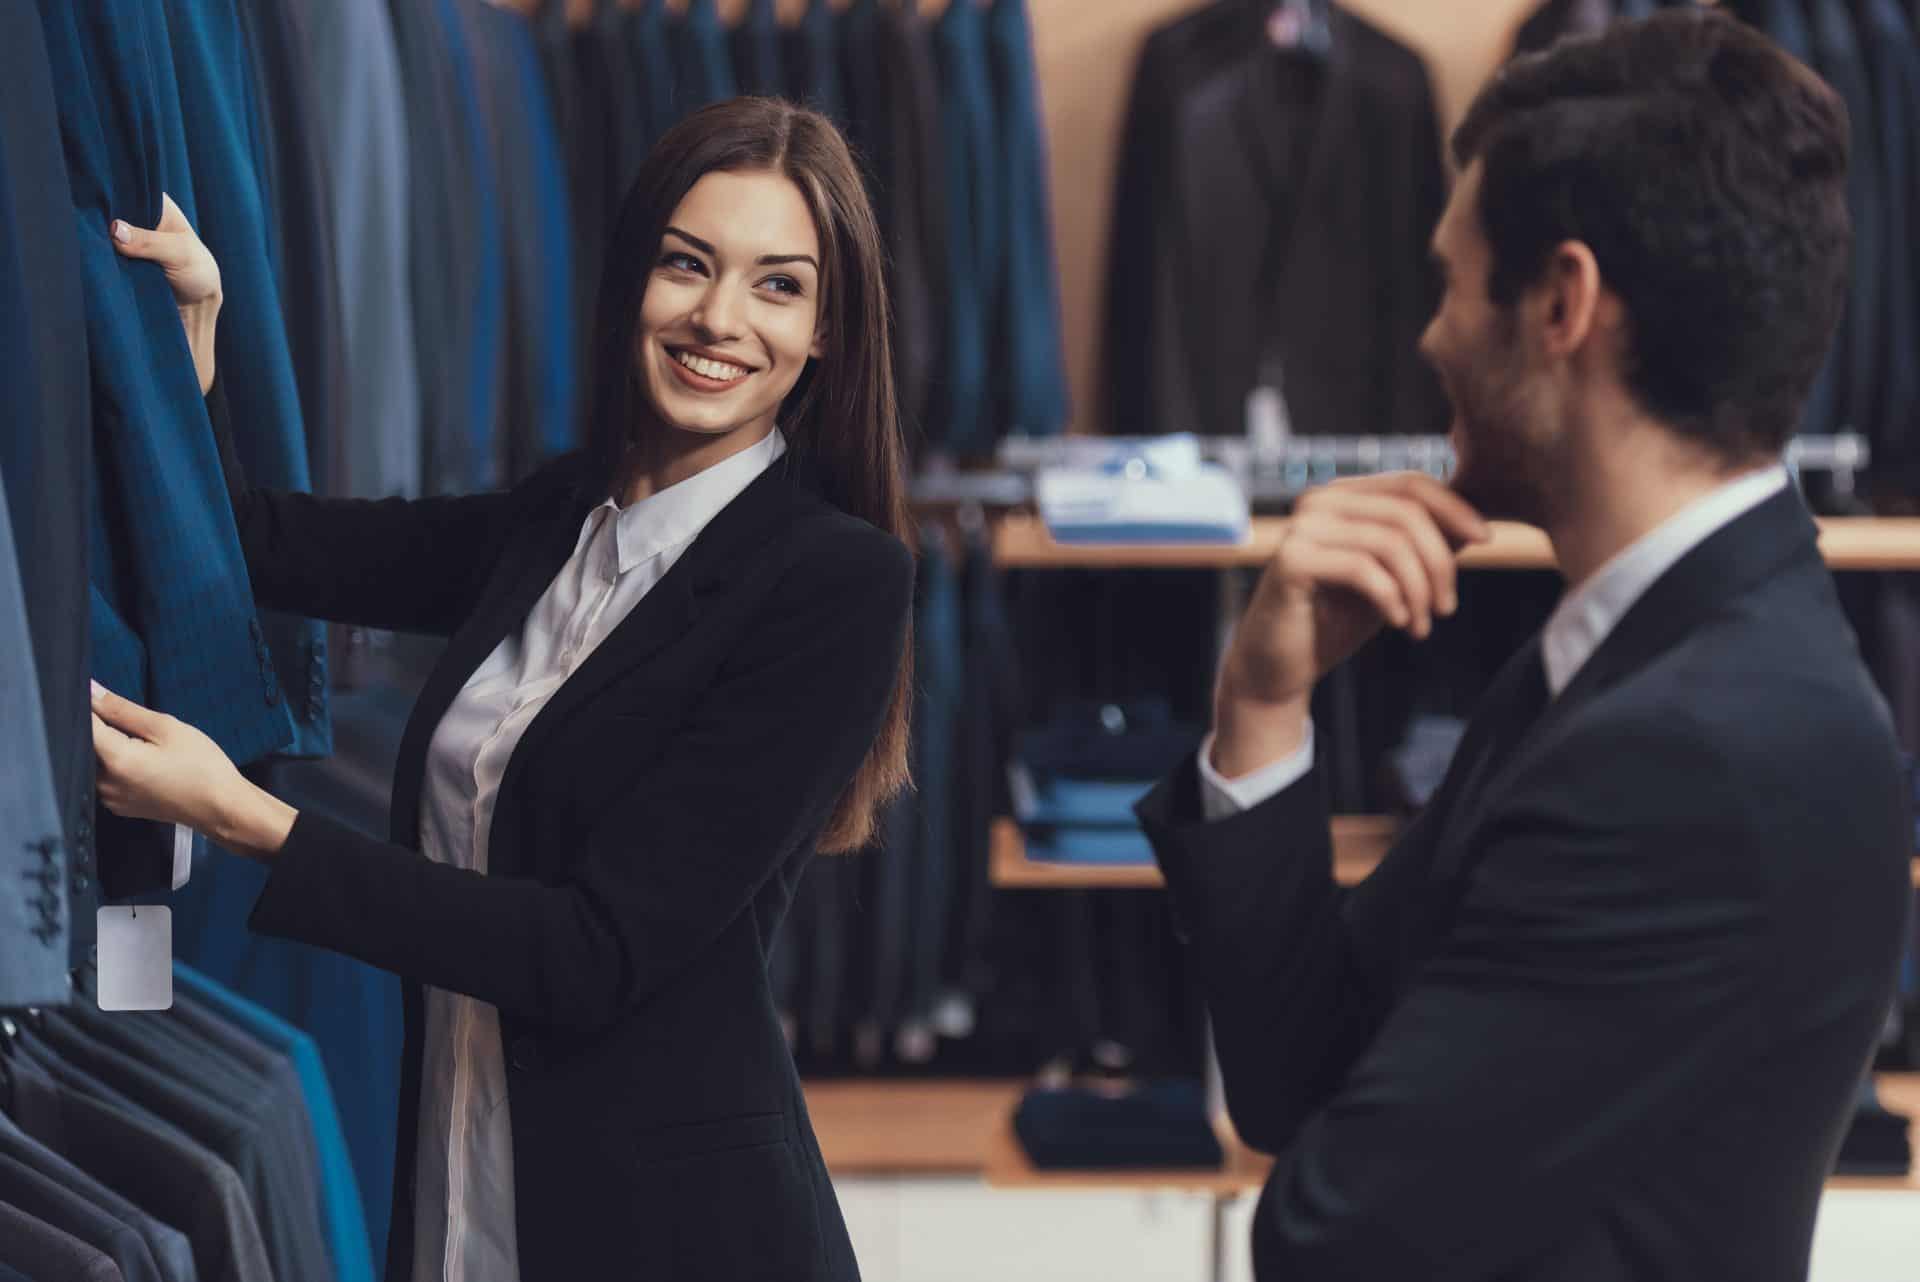 A importância do conceito 'foco no cliente'